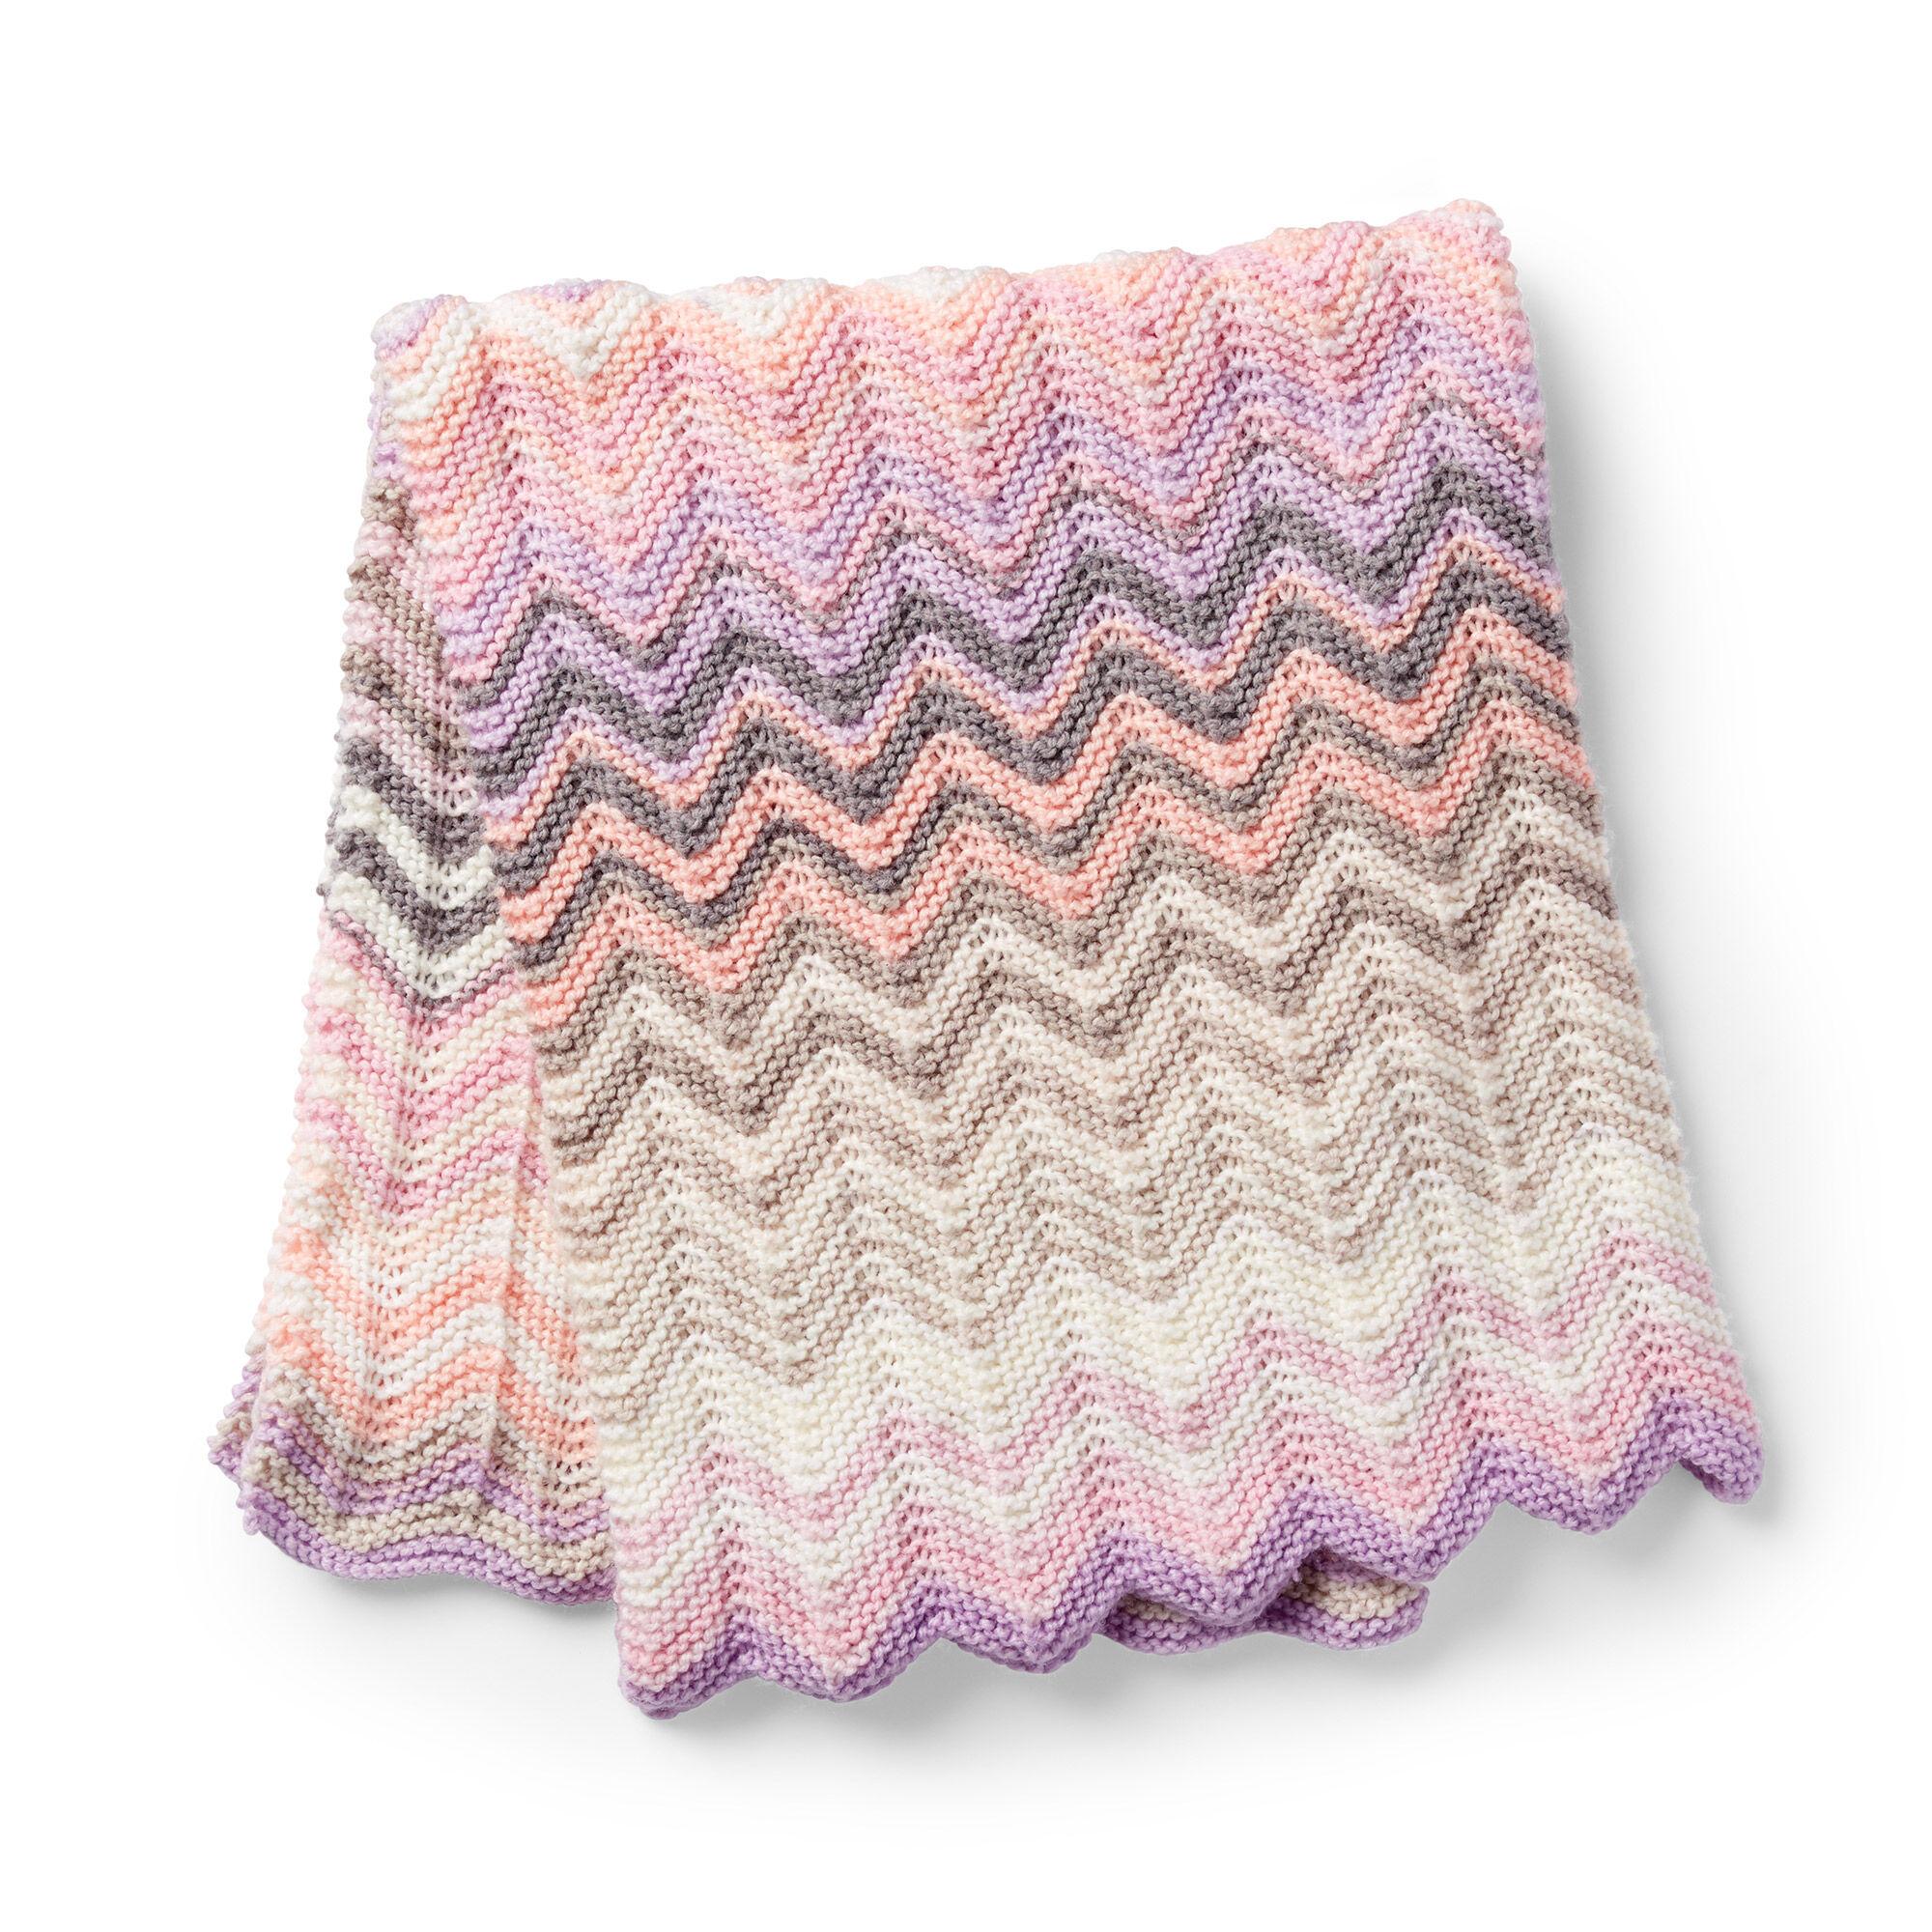 Caron Shaded Chevrons Knit Baby Blanket Pattern | Yarnspirations